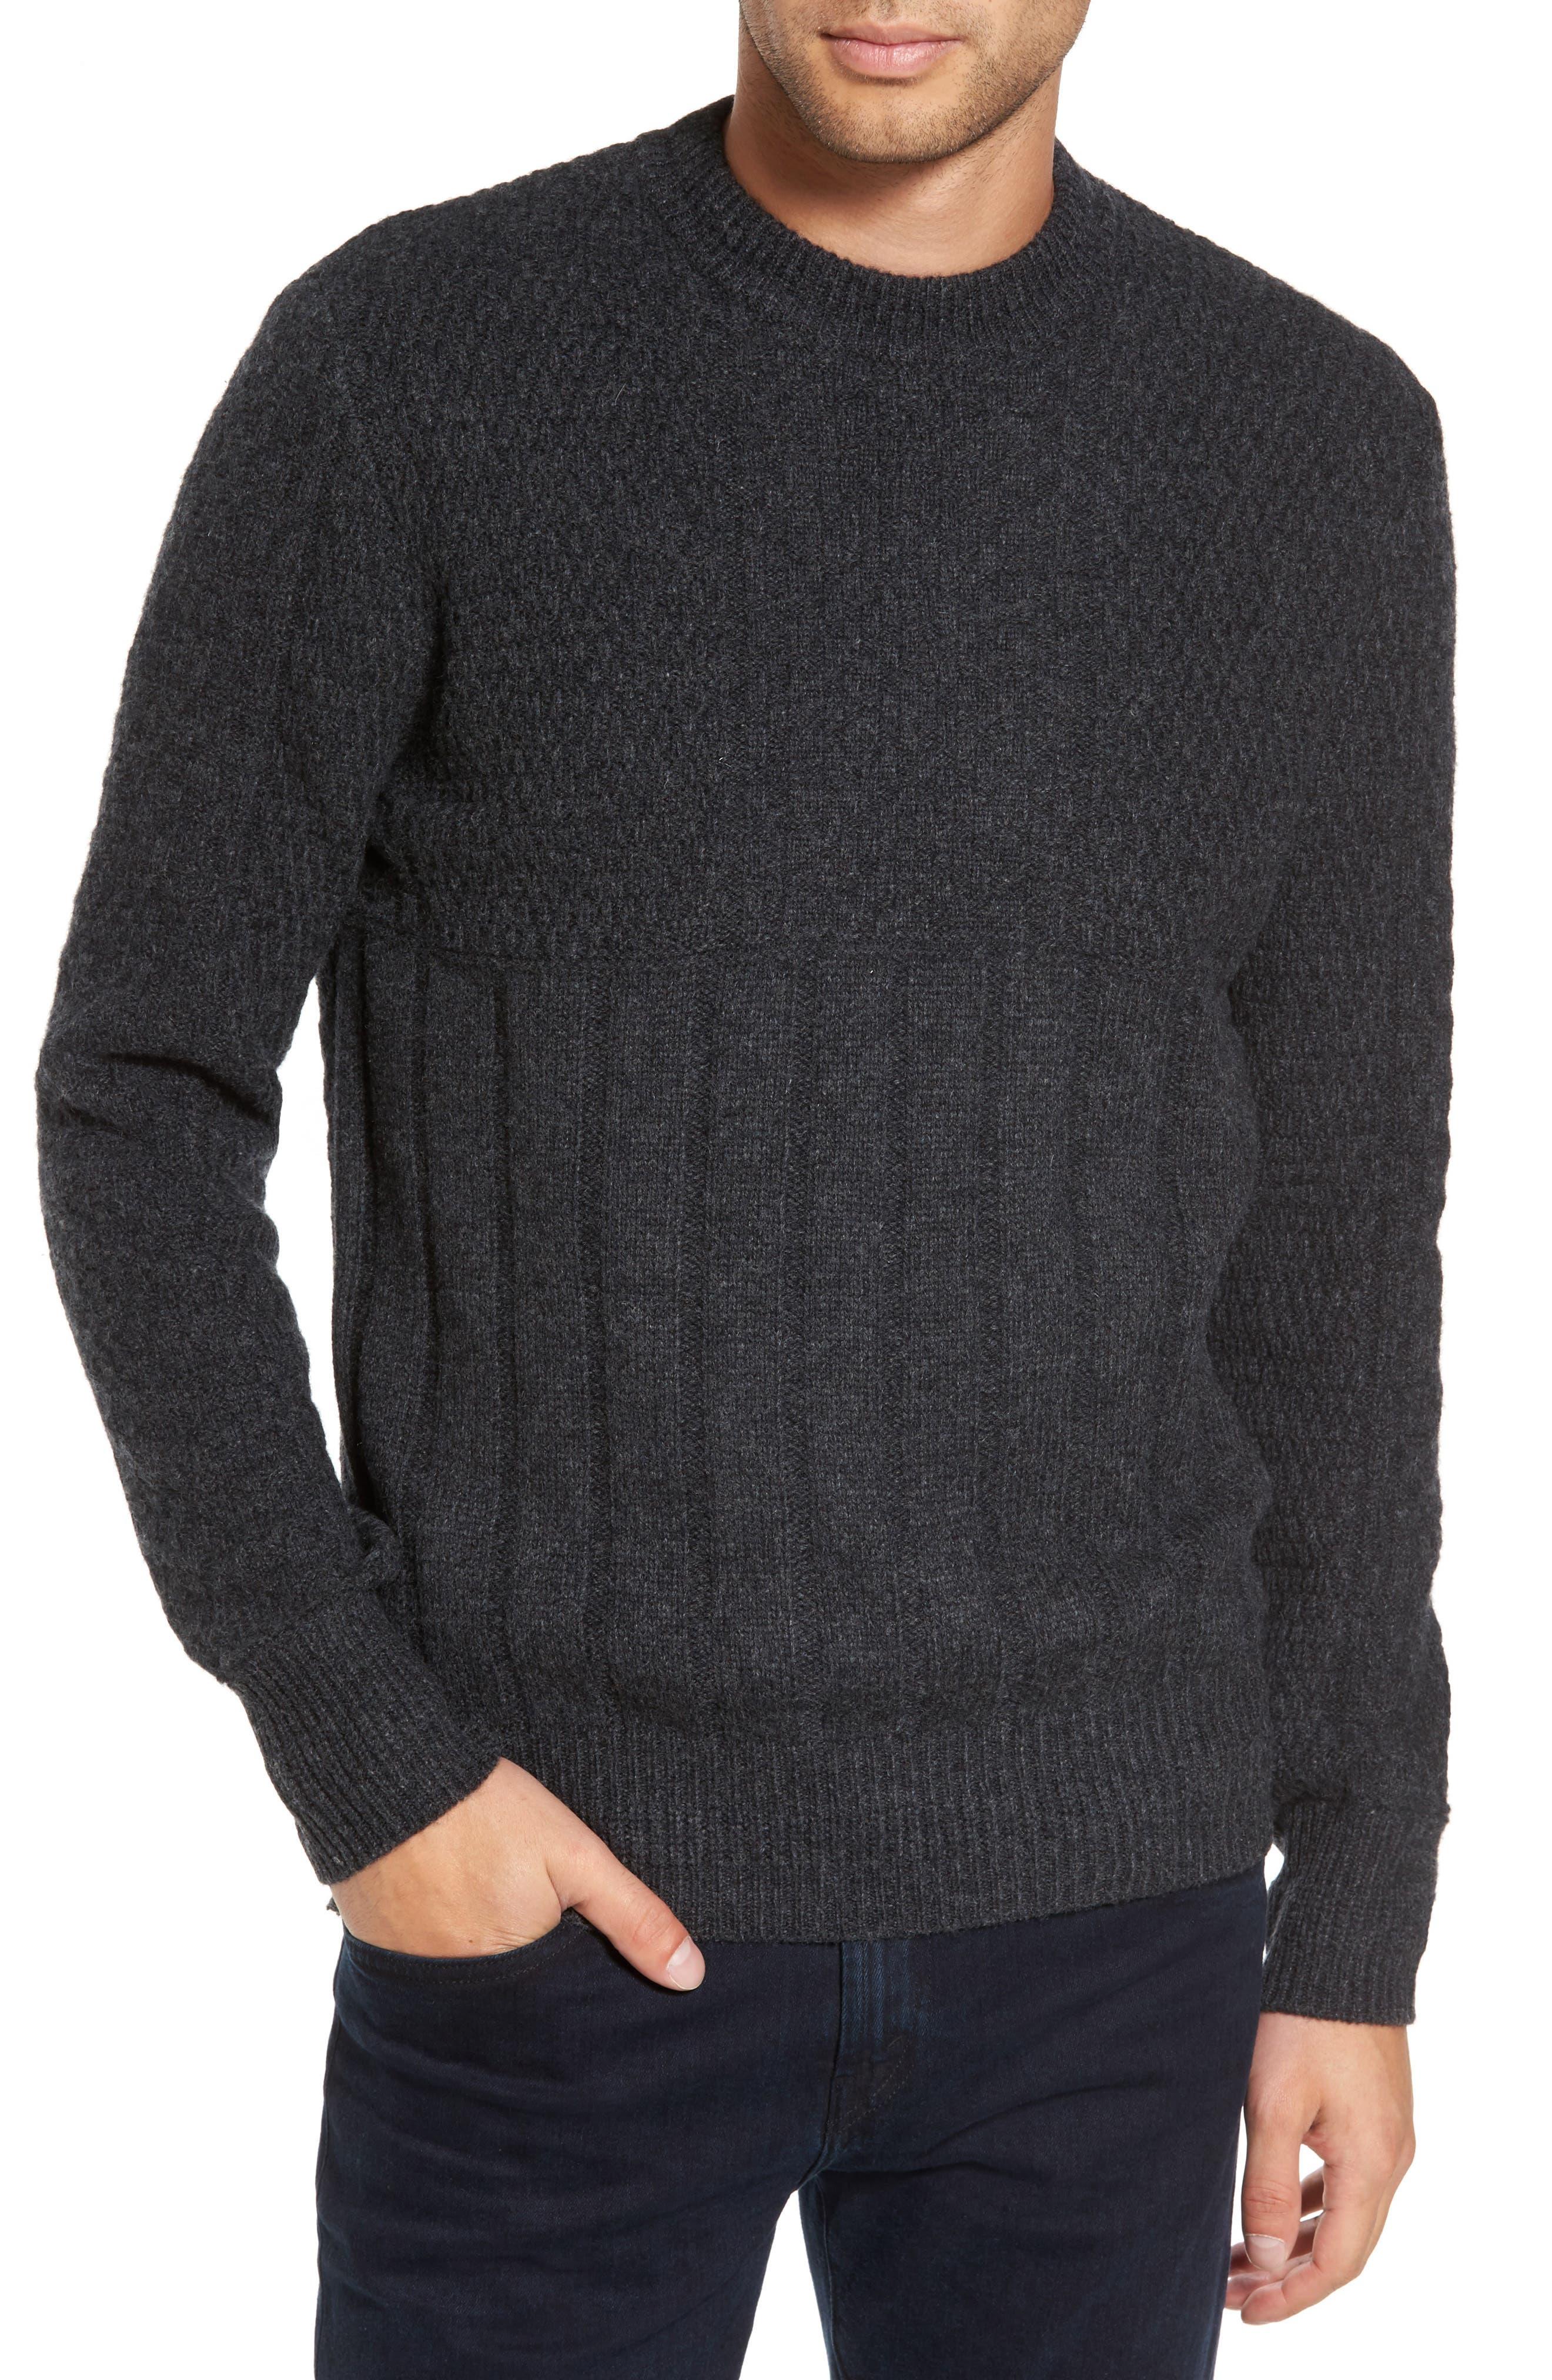 Wool Crewneck Sweater,                             Main thumbnail 1, color,                             020